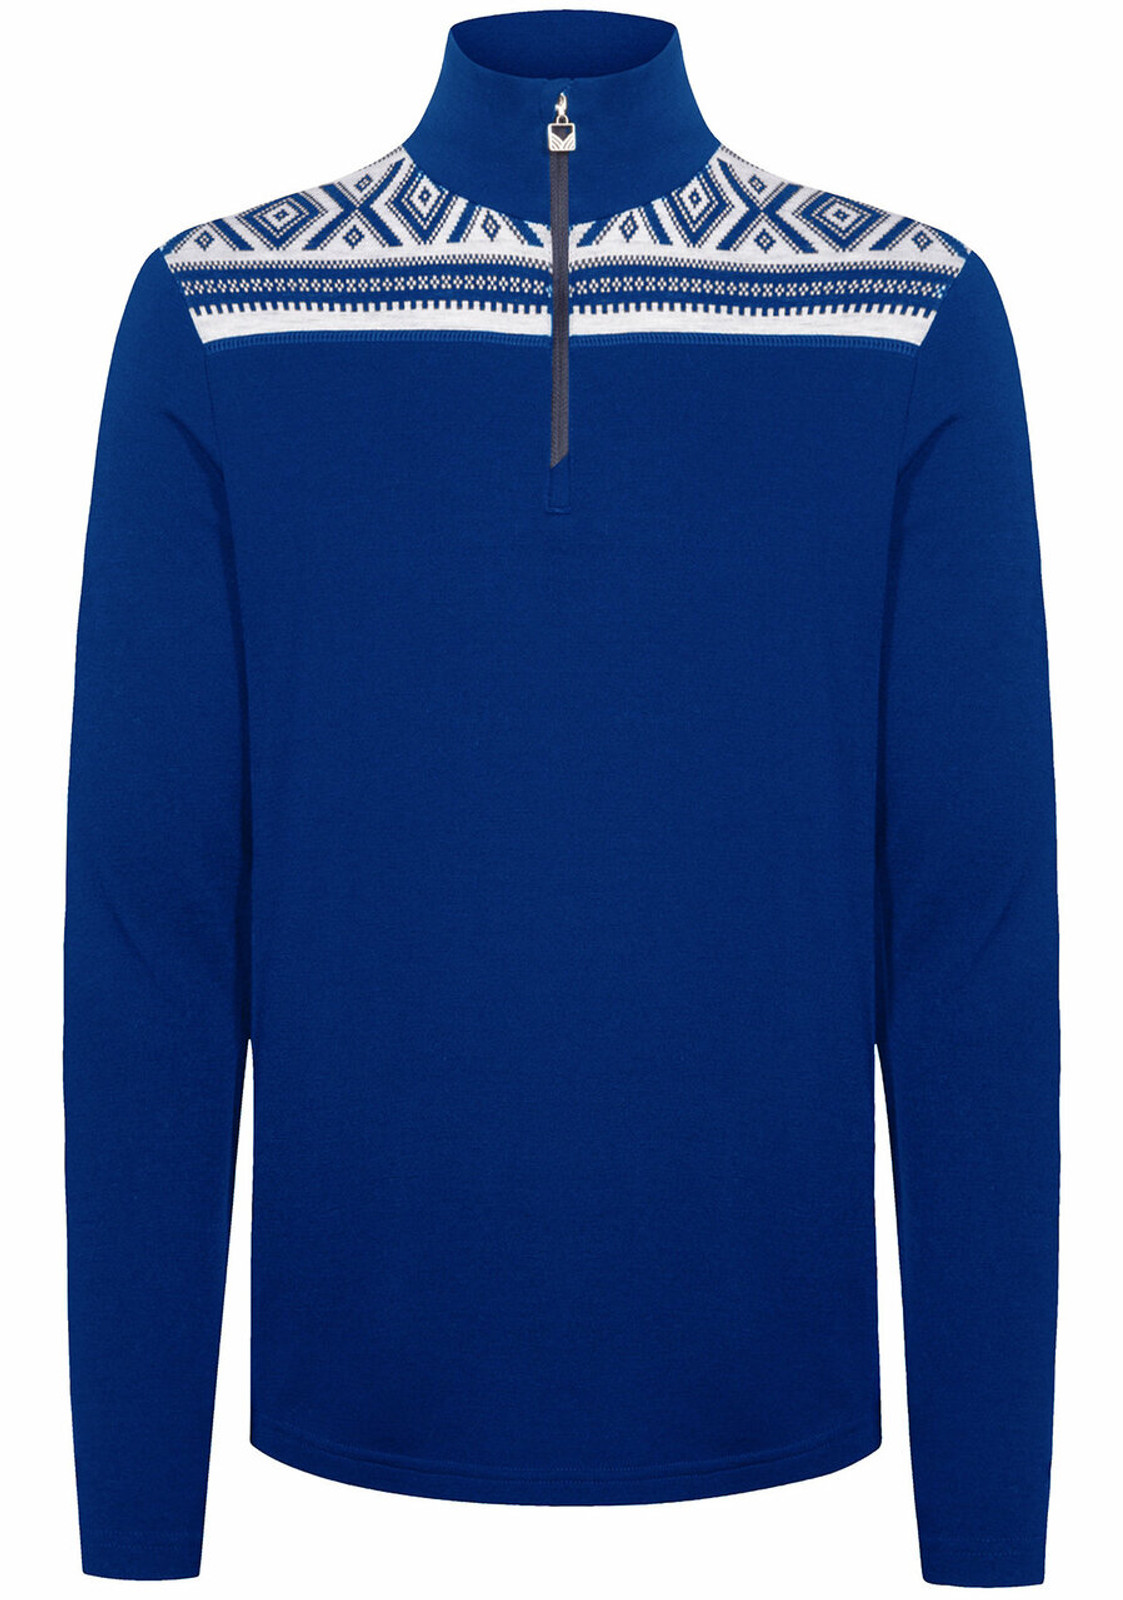 Dale of Norway Cortina Basic Men's Sweater (Base Layer), Ultramarine/Off White, 93531H